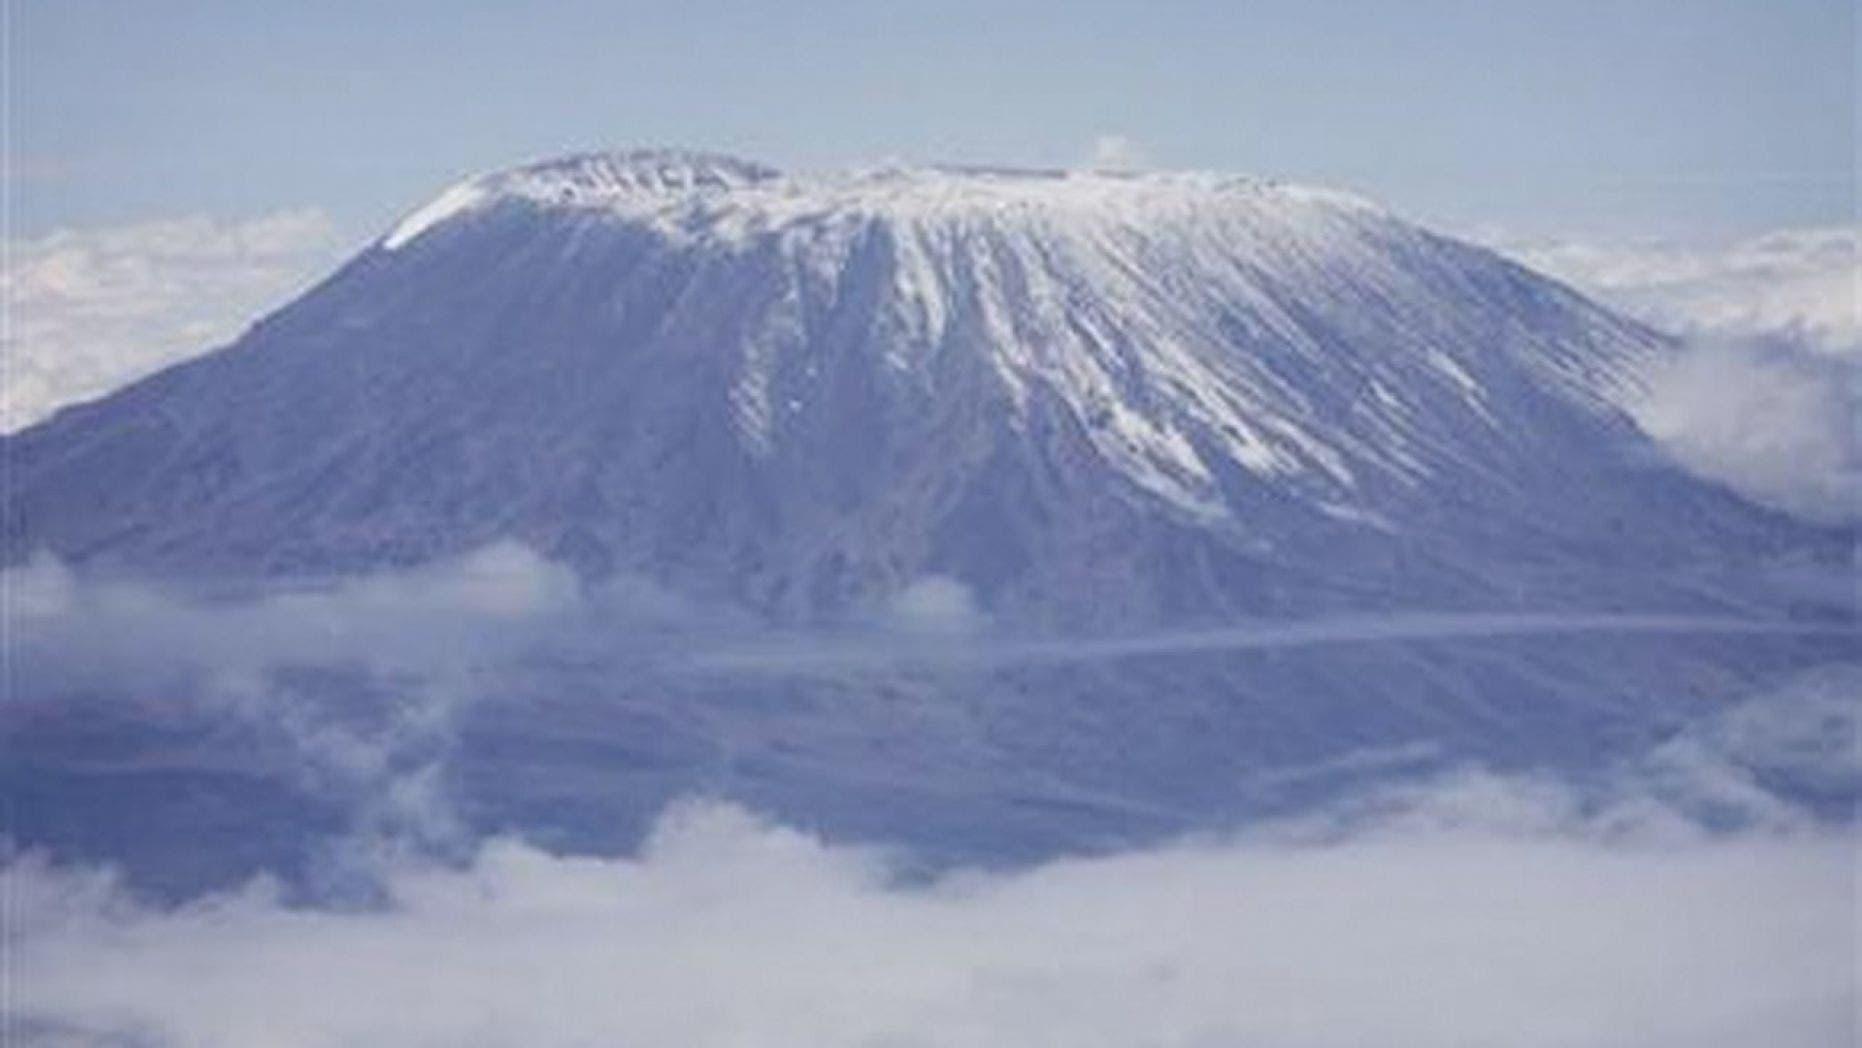 Mark Pattison's seven summits climb includes Mount Kilimanjaro in Africa.